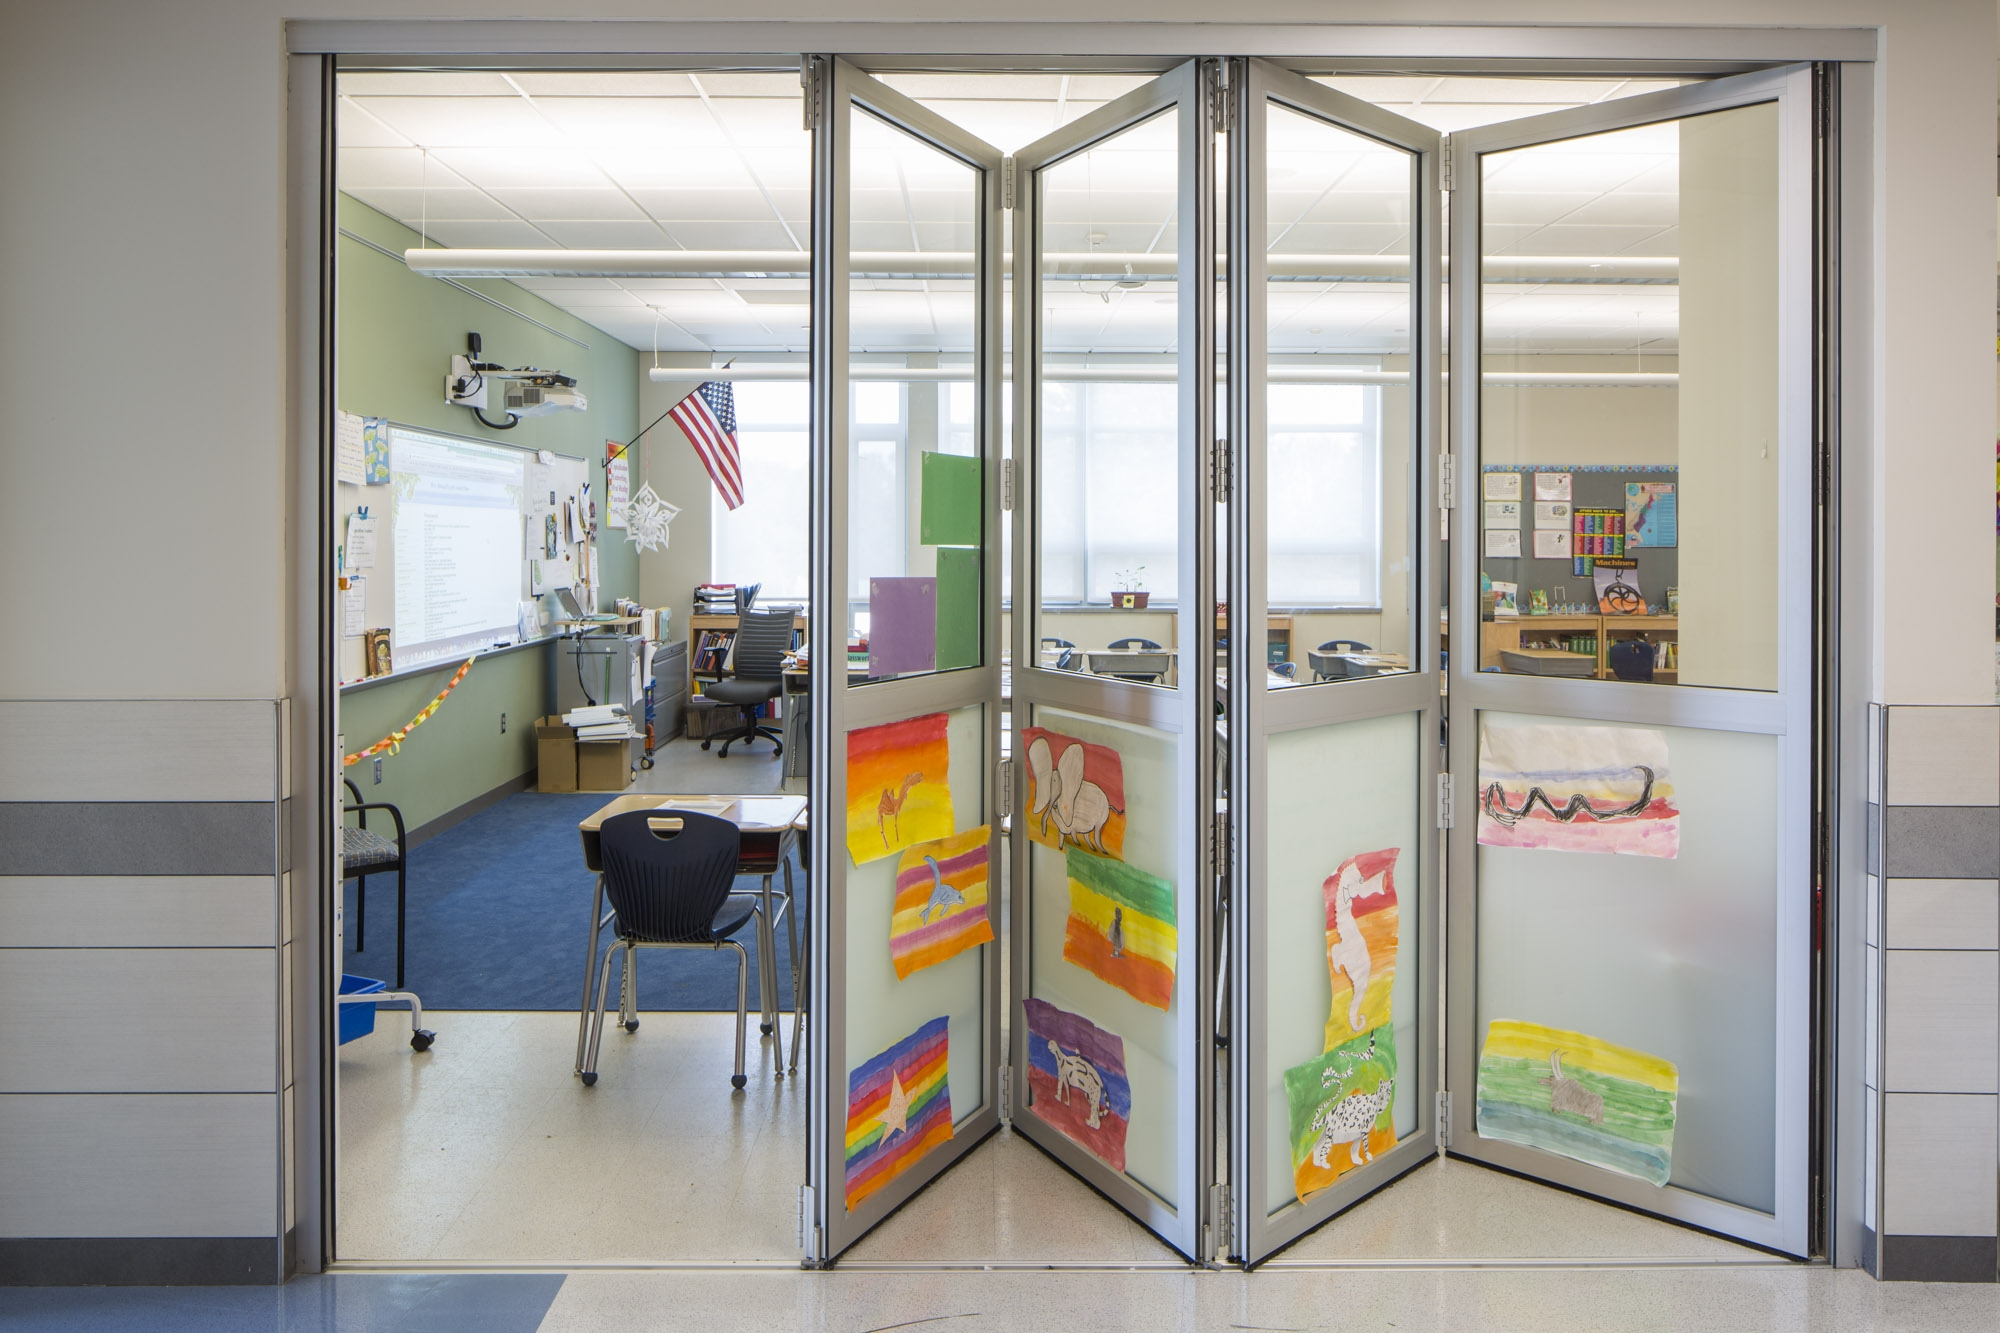 Bancroft Elementary School Classroom Design